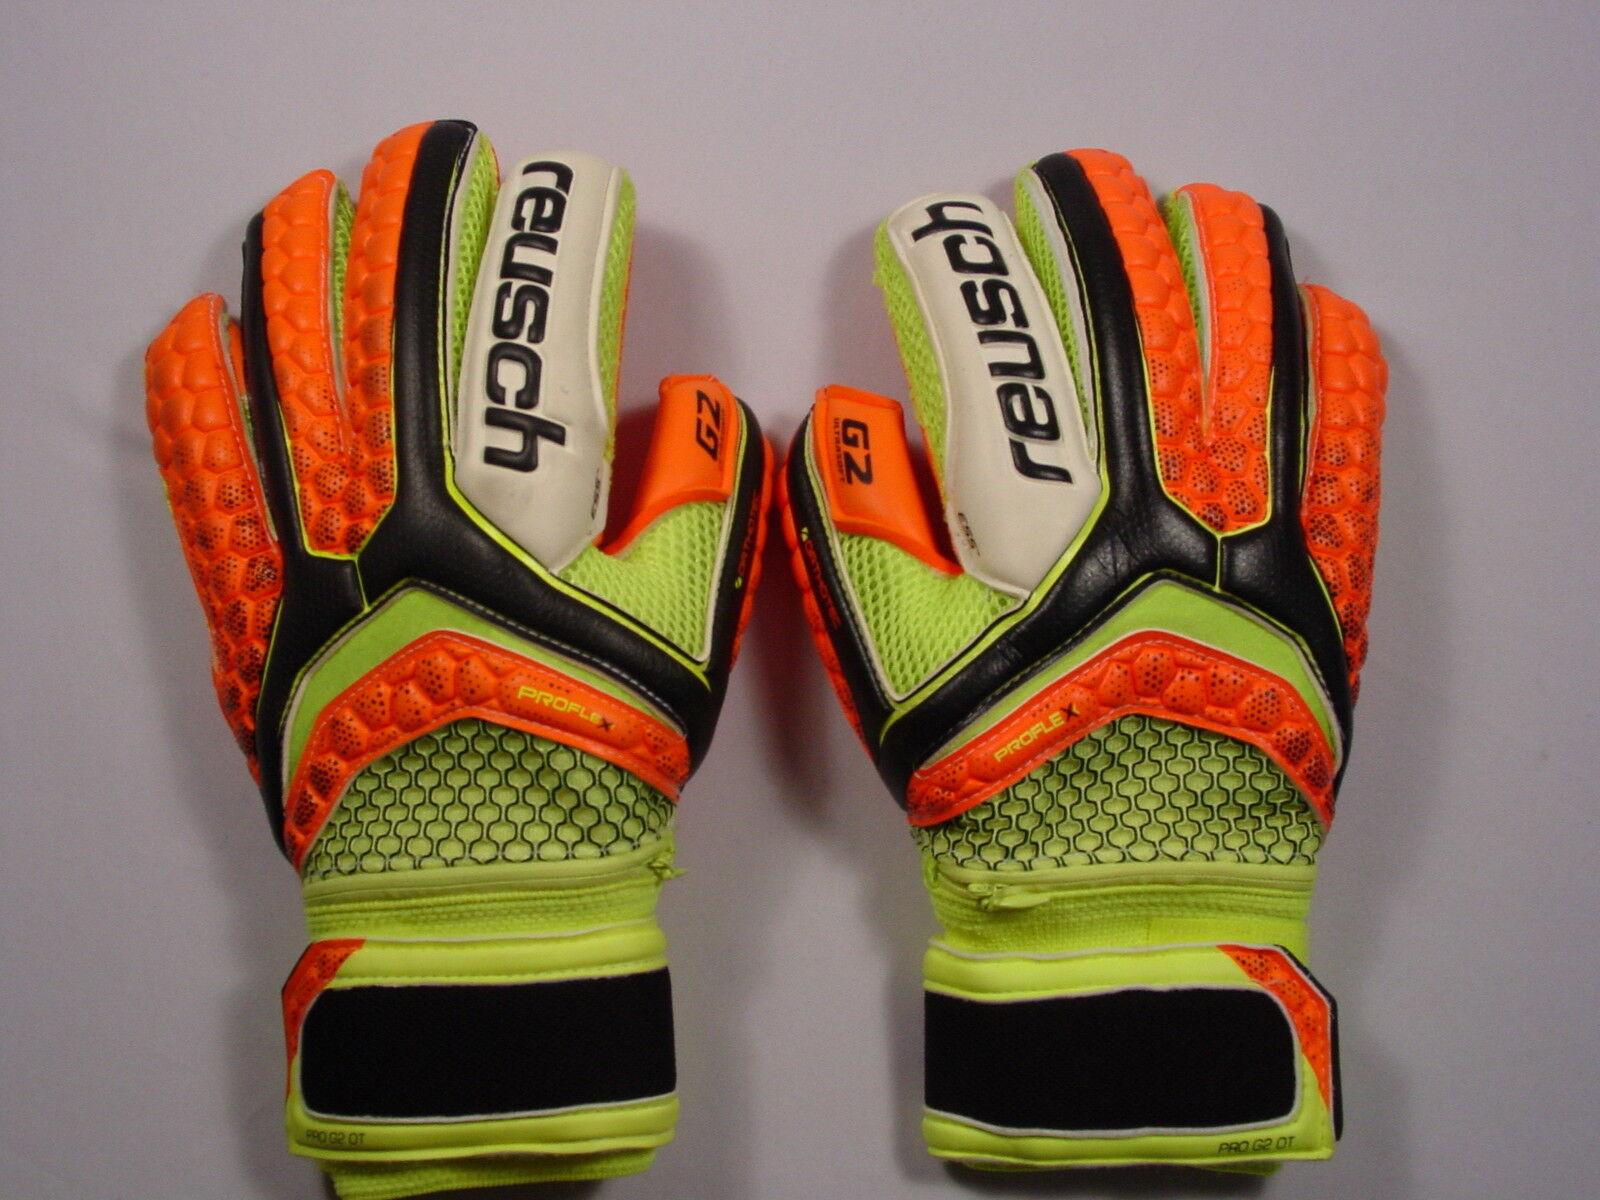 Reusch Fußball Torwarthandschuhe Puls pro G2 Ortho Ortho Ortho Tec Finger Streben 3670100s efbd89